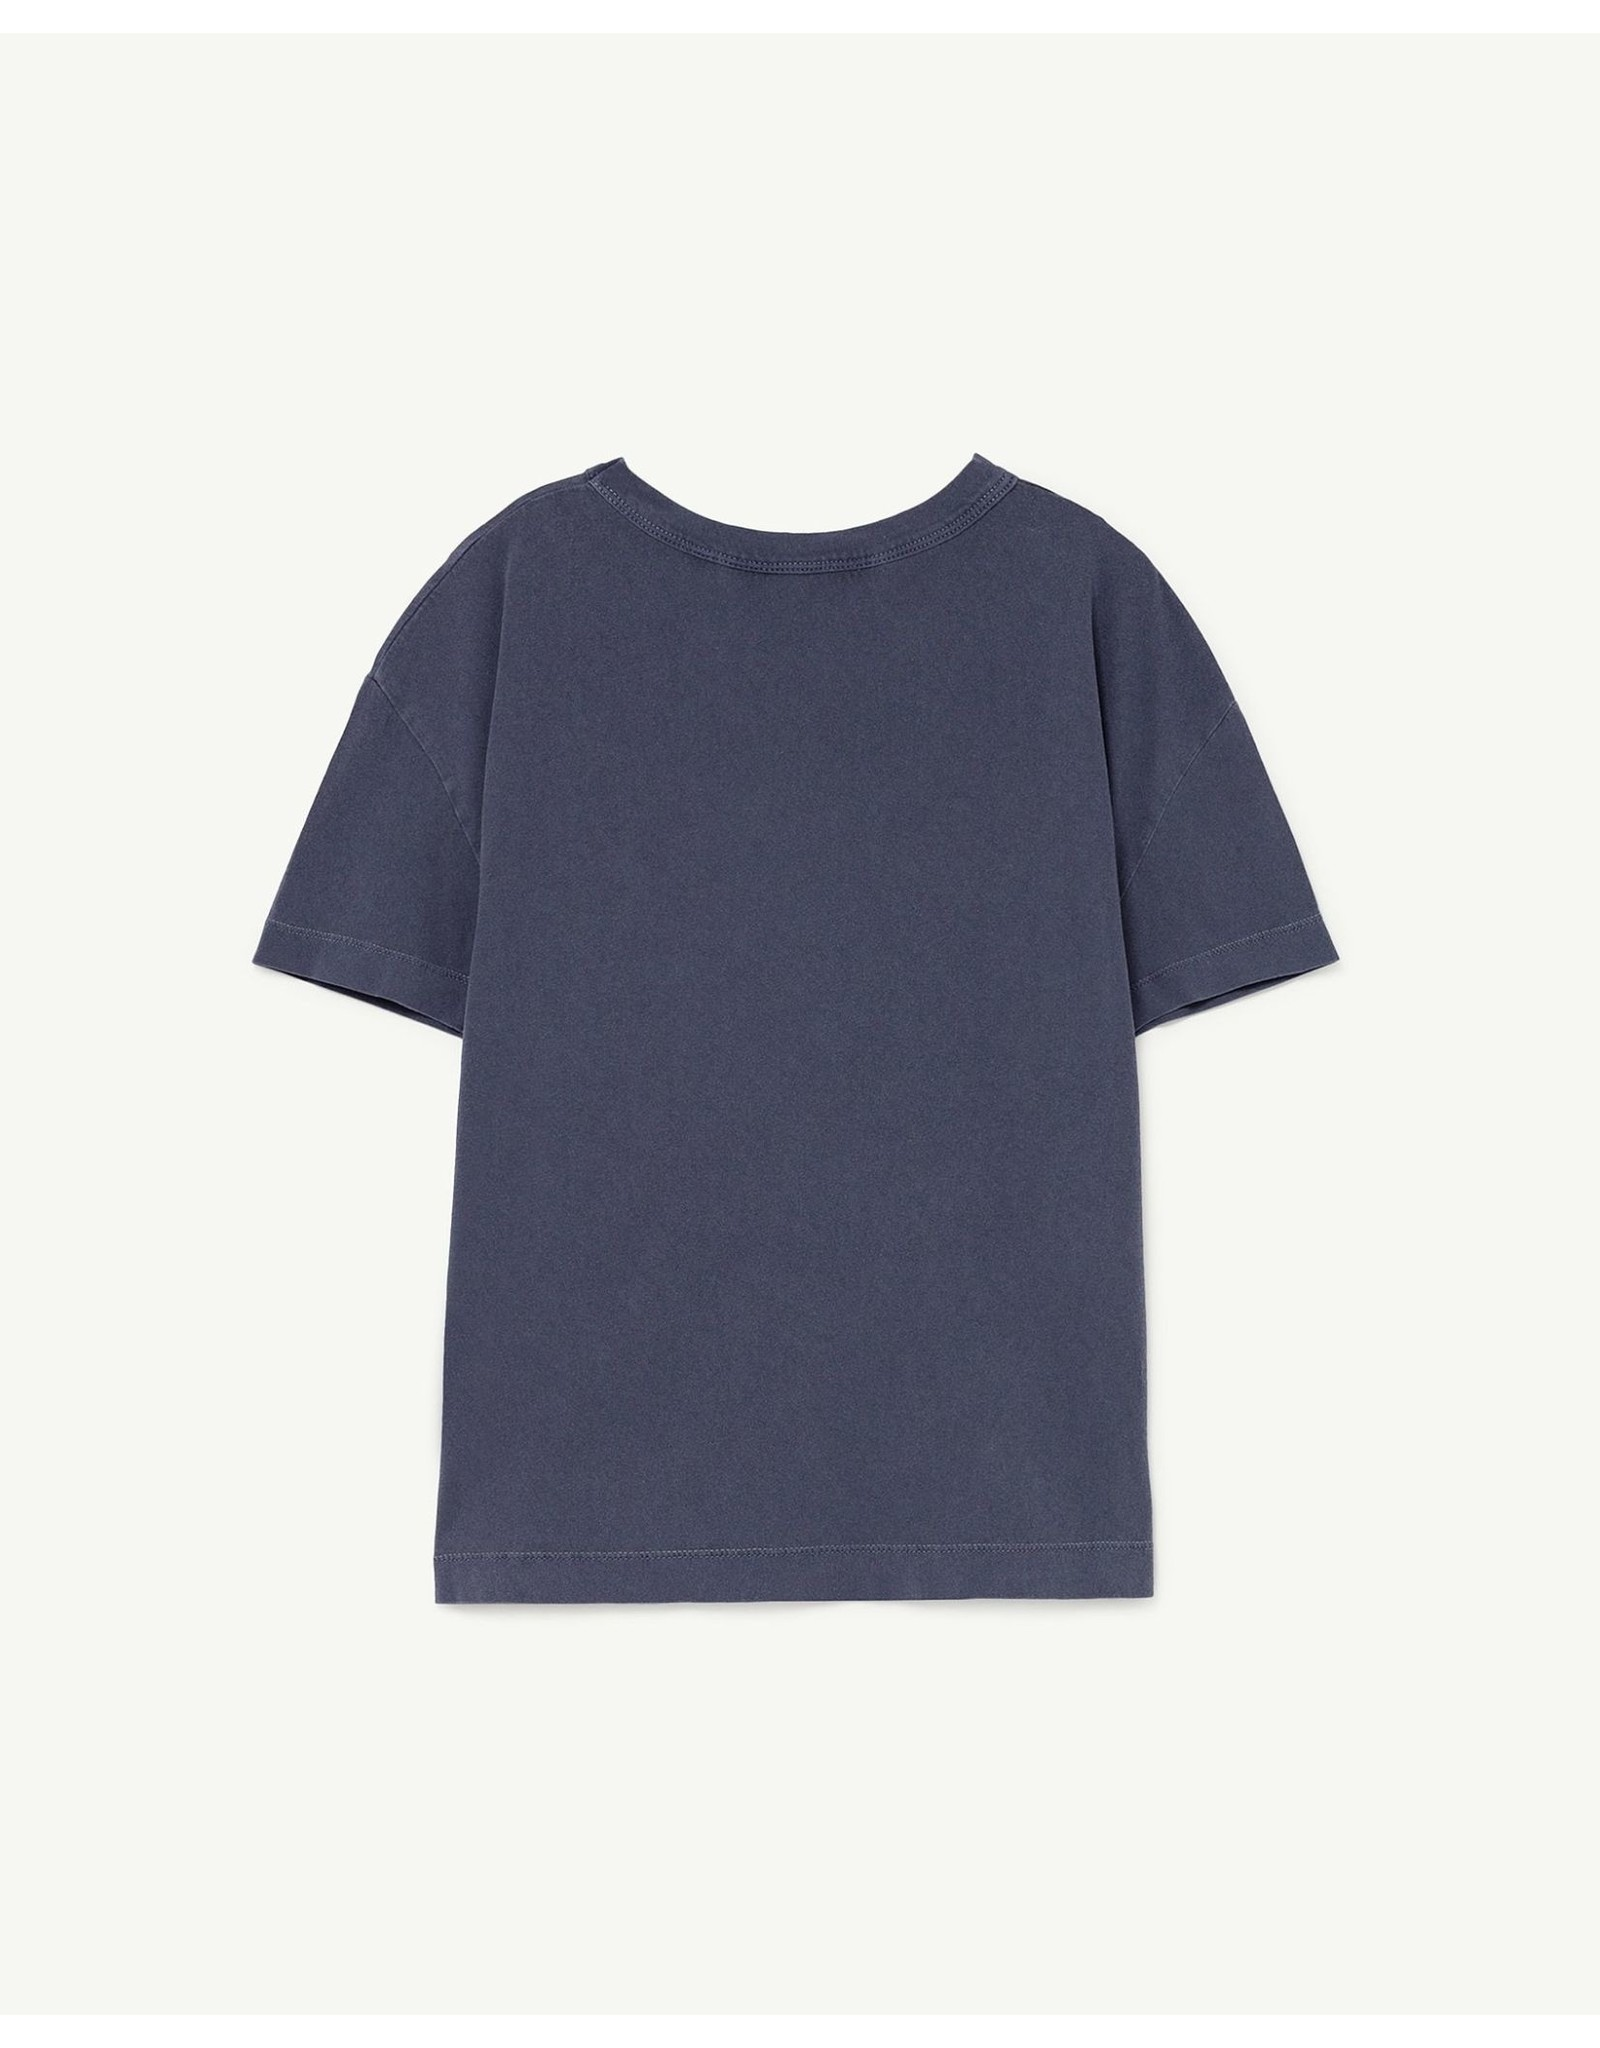 TAO PS21 001161BJ Rooster Kids T-shirt navy